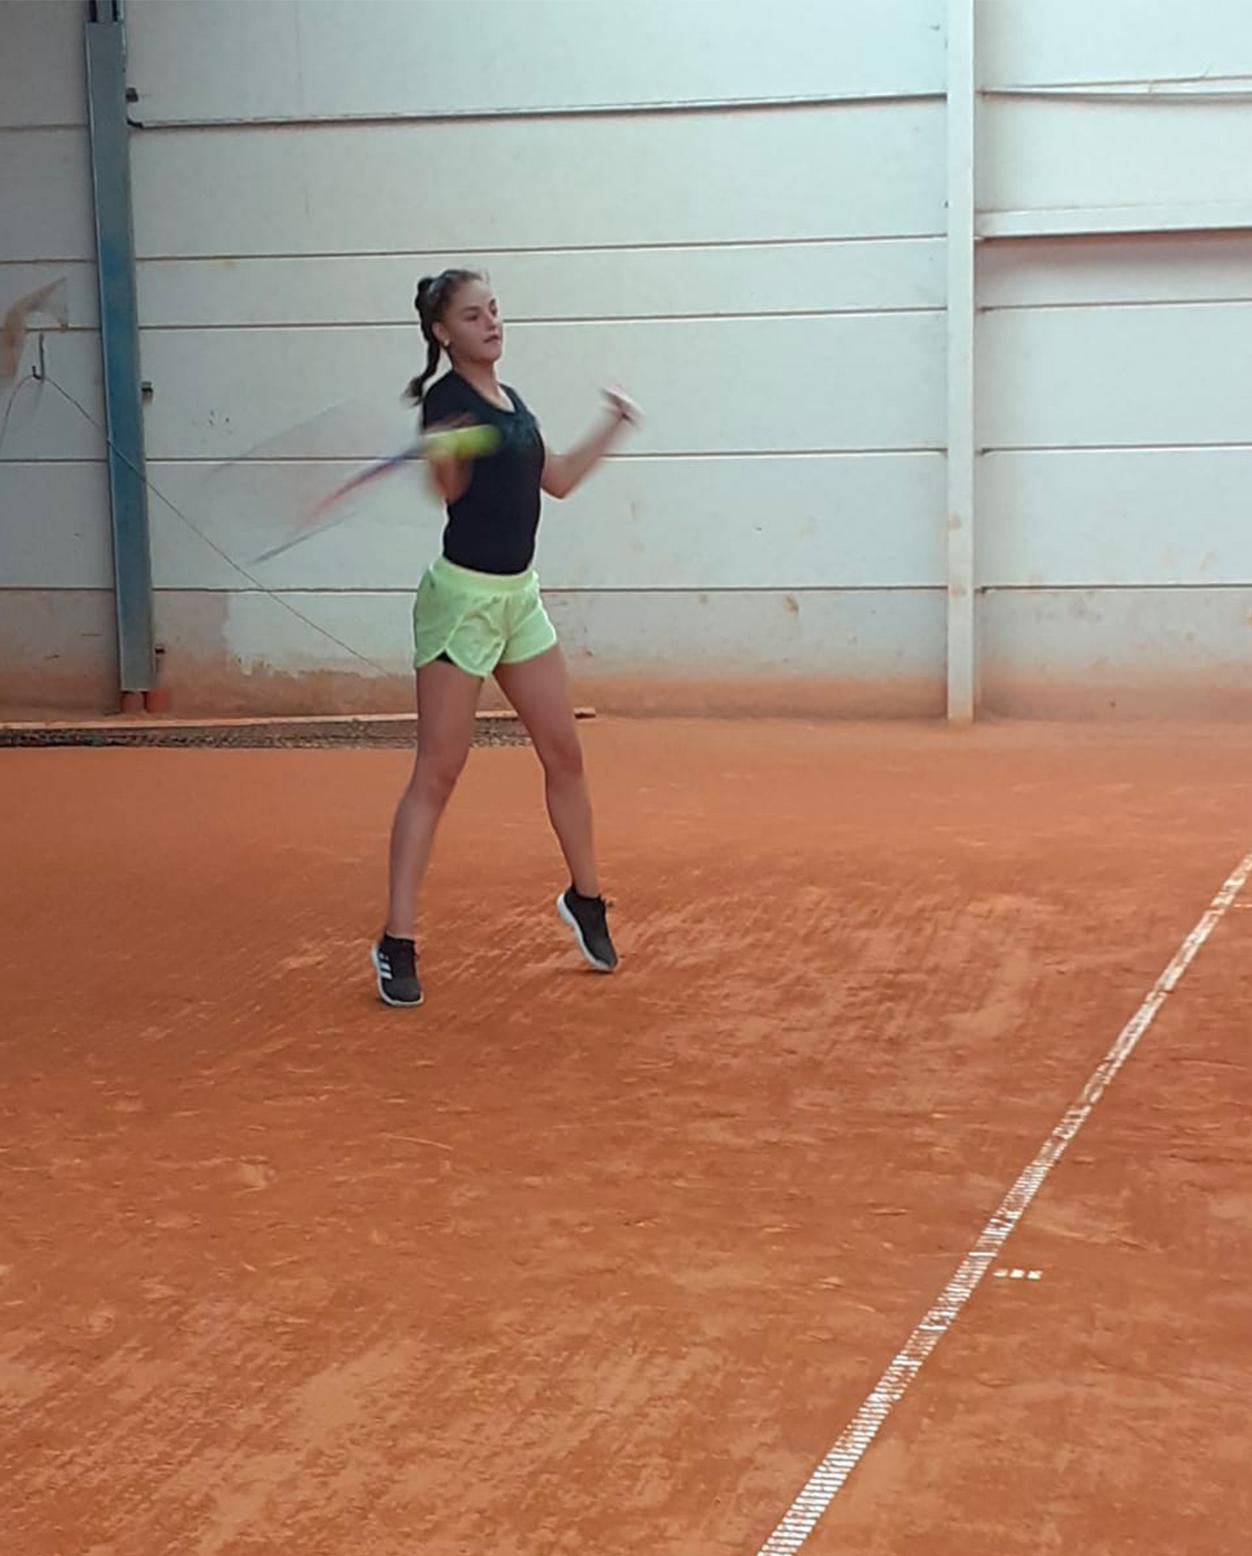 https://www.team-bms-tennis.fr/wp-content/uploads/2020/09/Nevena.jpg